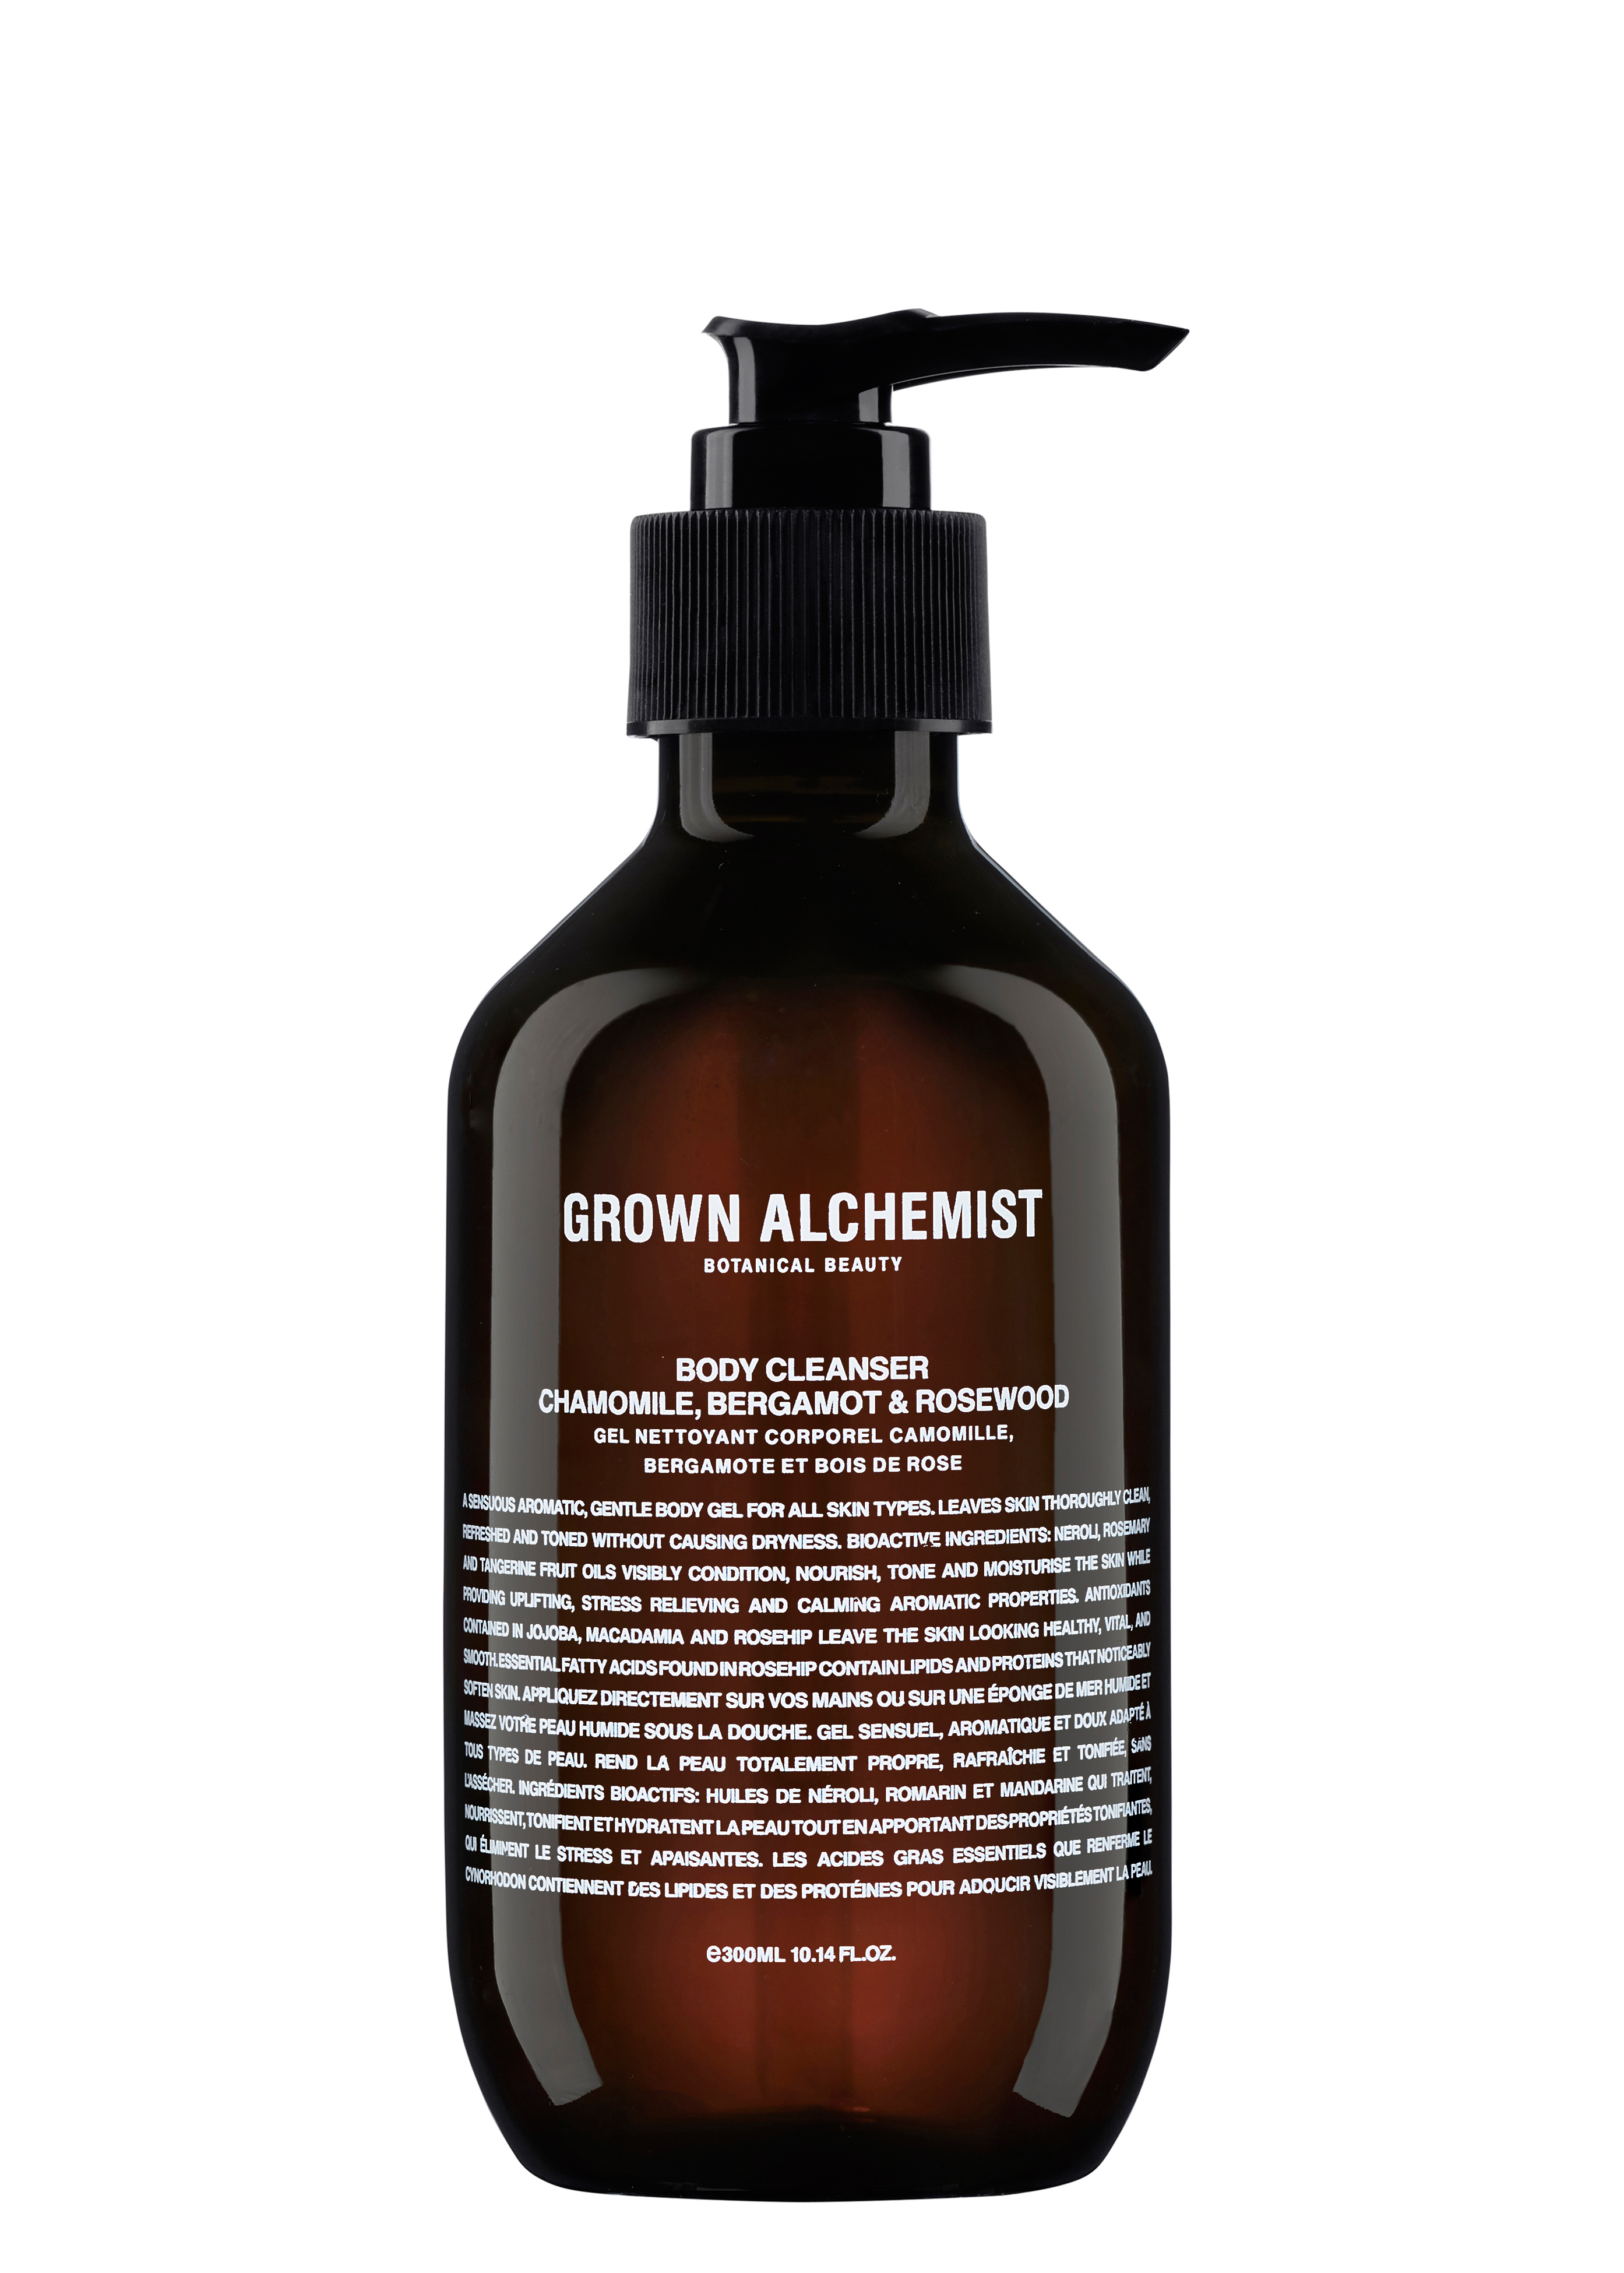 Chamomile/Bergamot/Rosewood Body Cleanser